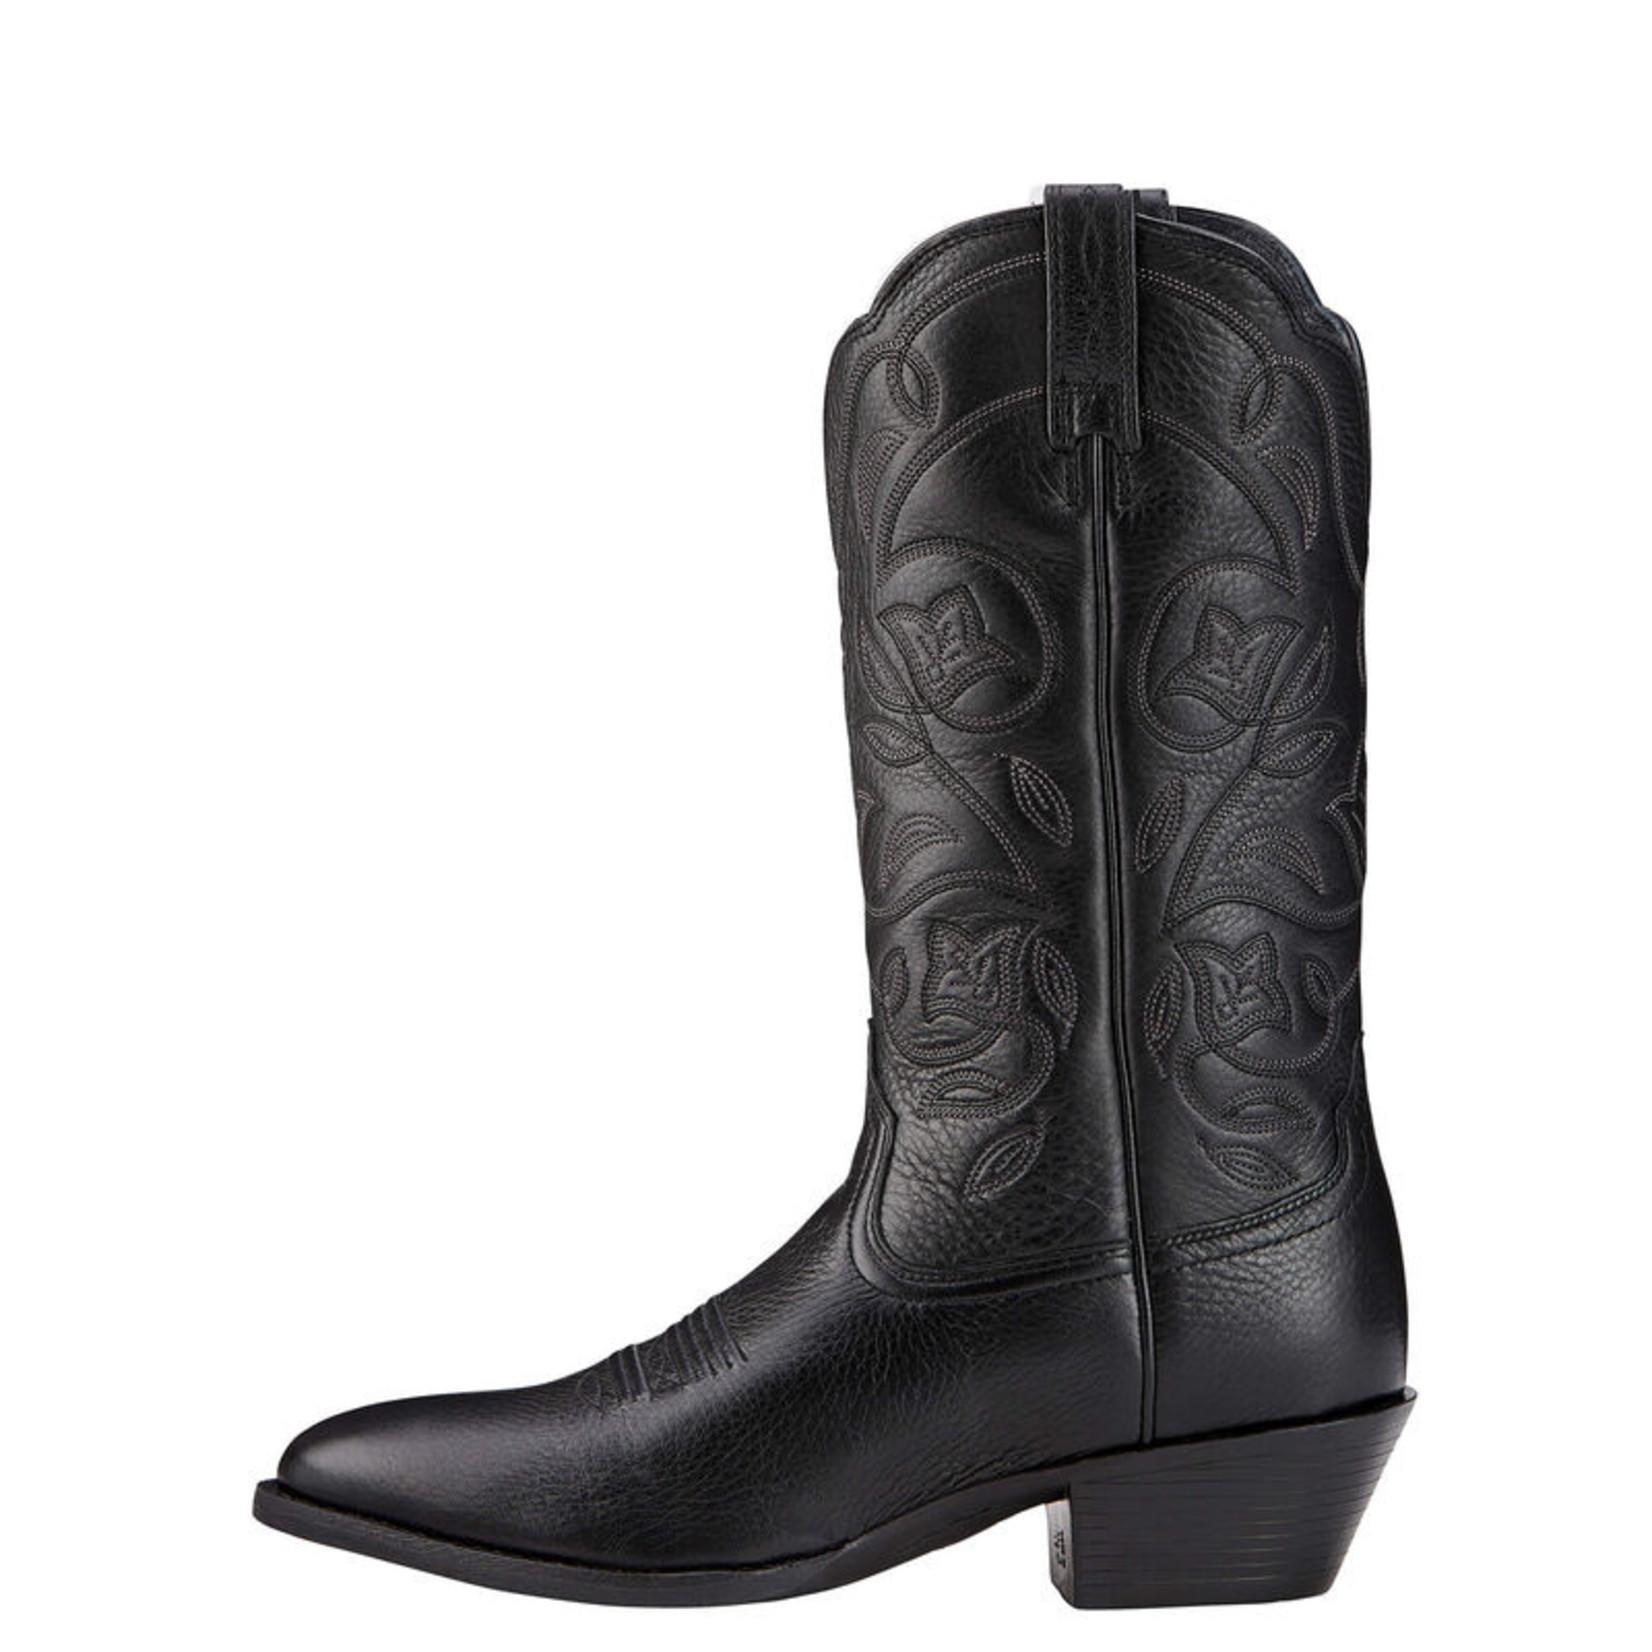 Ariat Women's Ariat Heritage R Toe Wide Calf 10001037